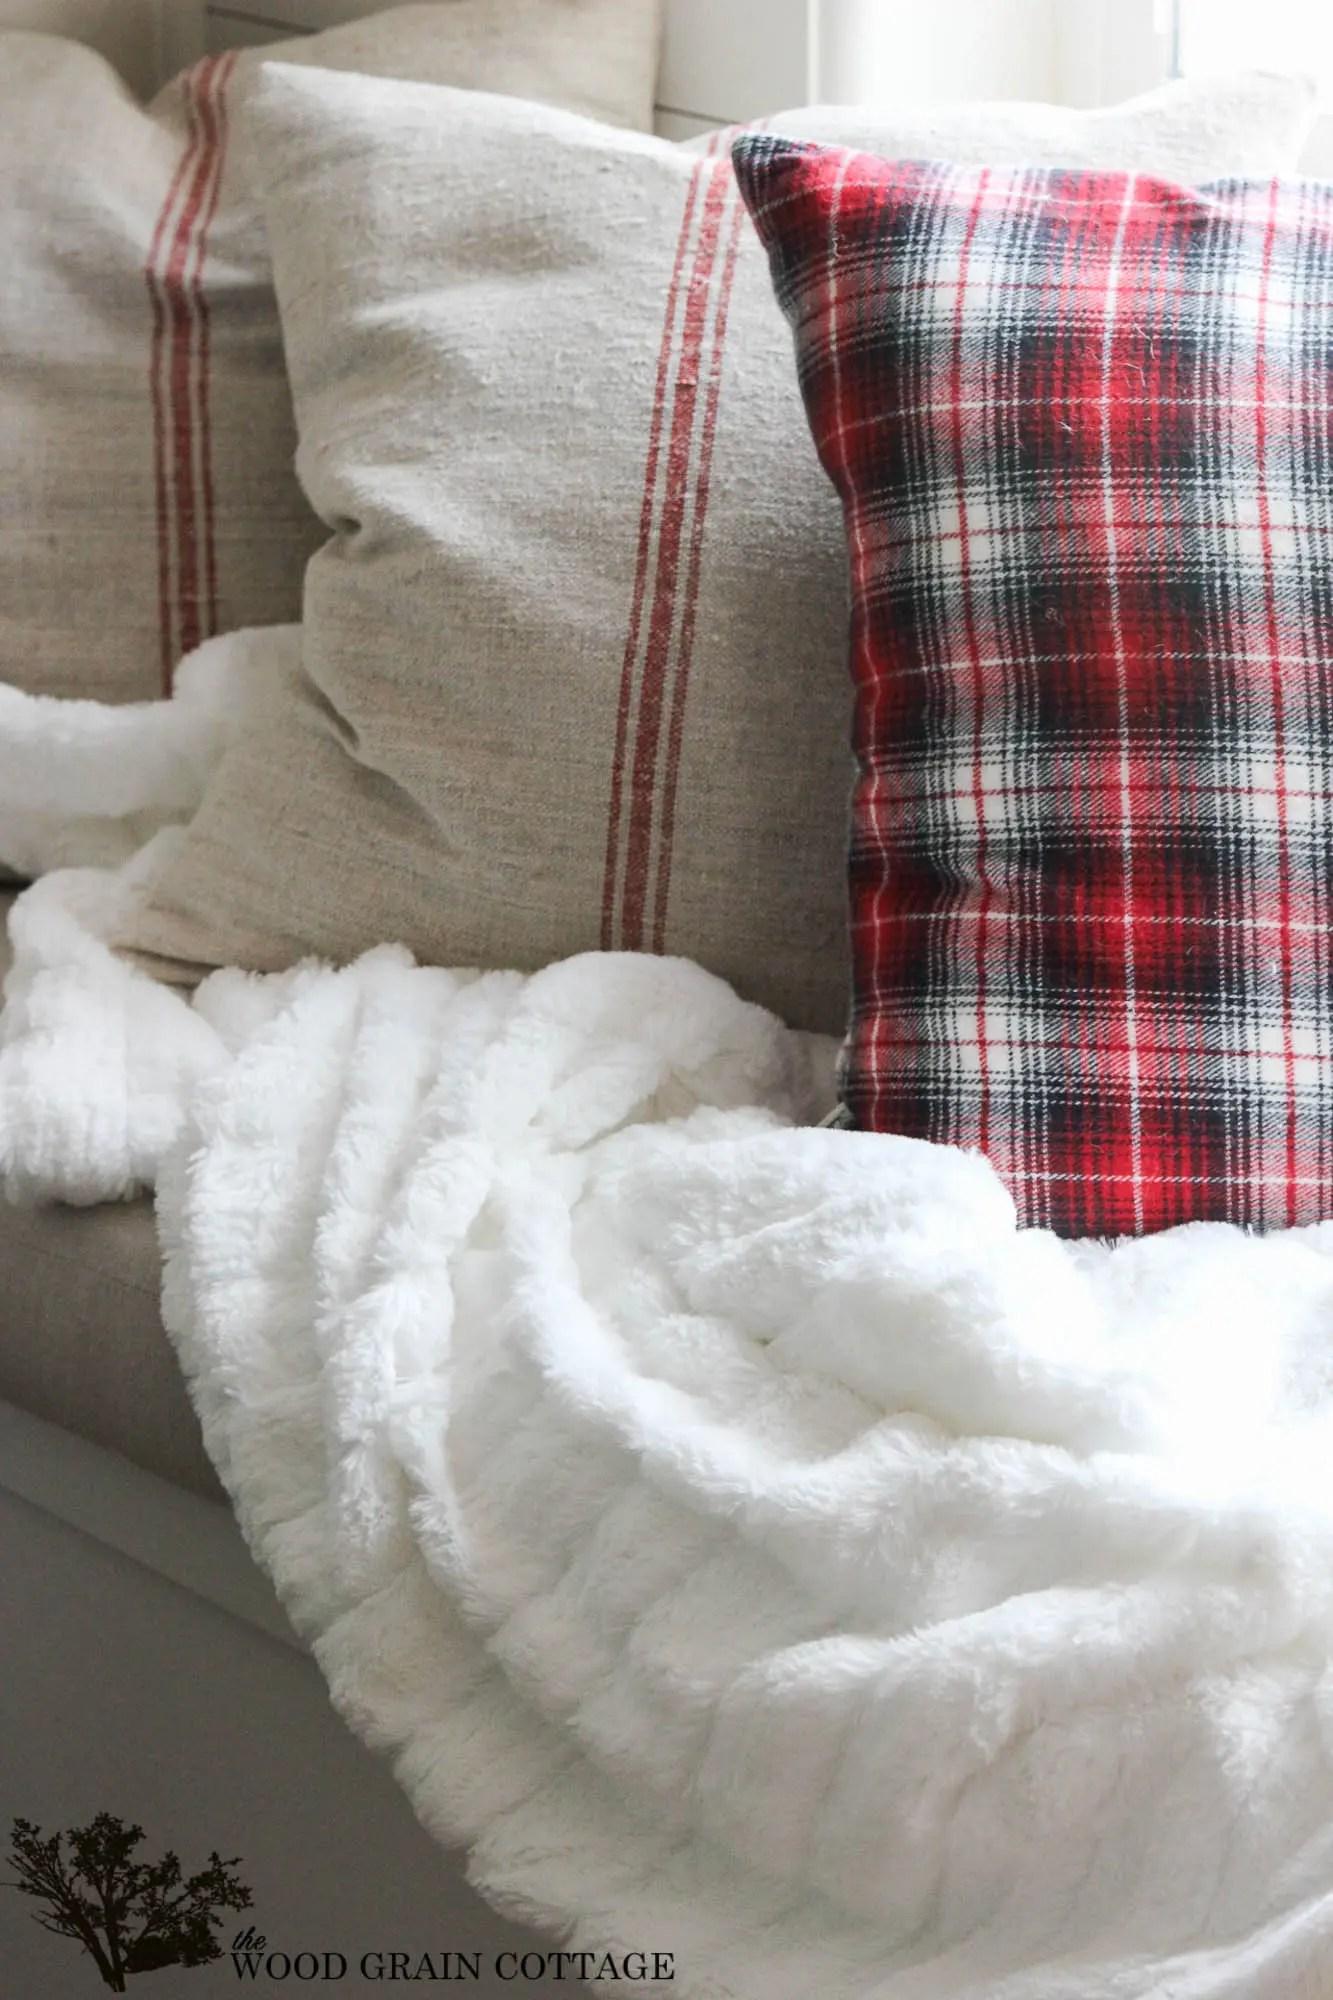 DIY White Fluffy Blanket The Wood Grain Cottage